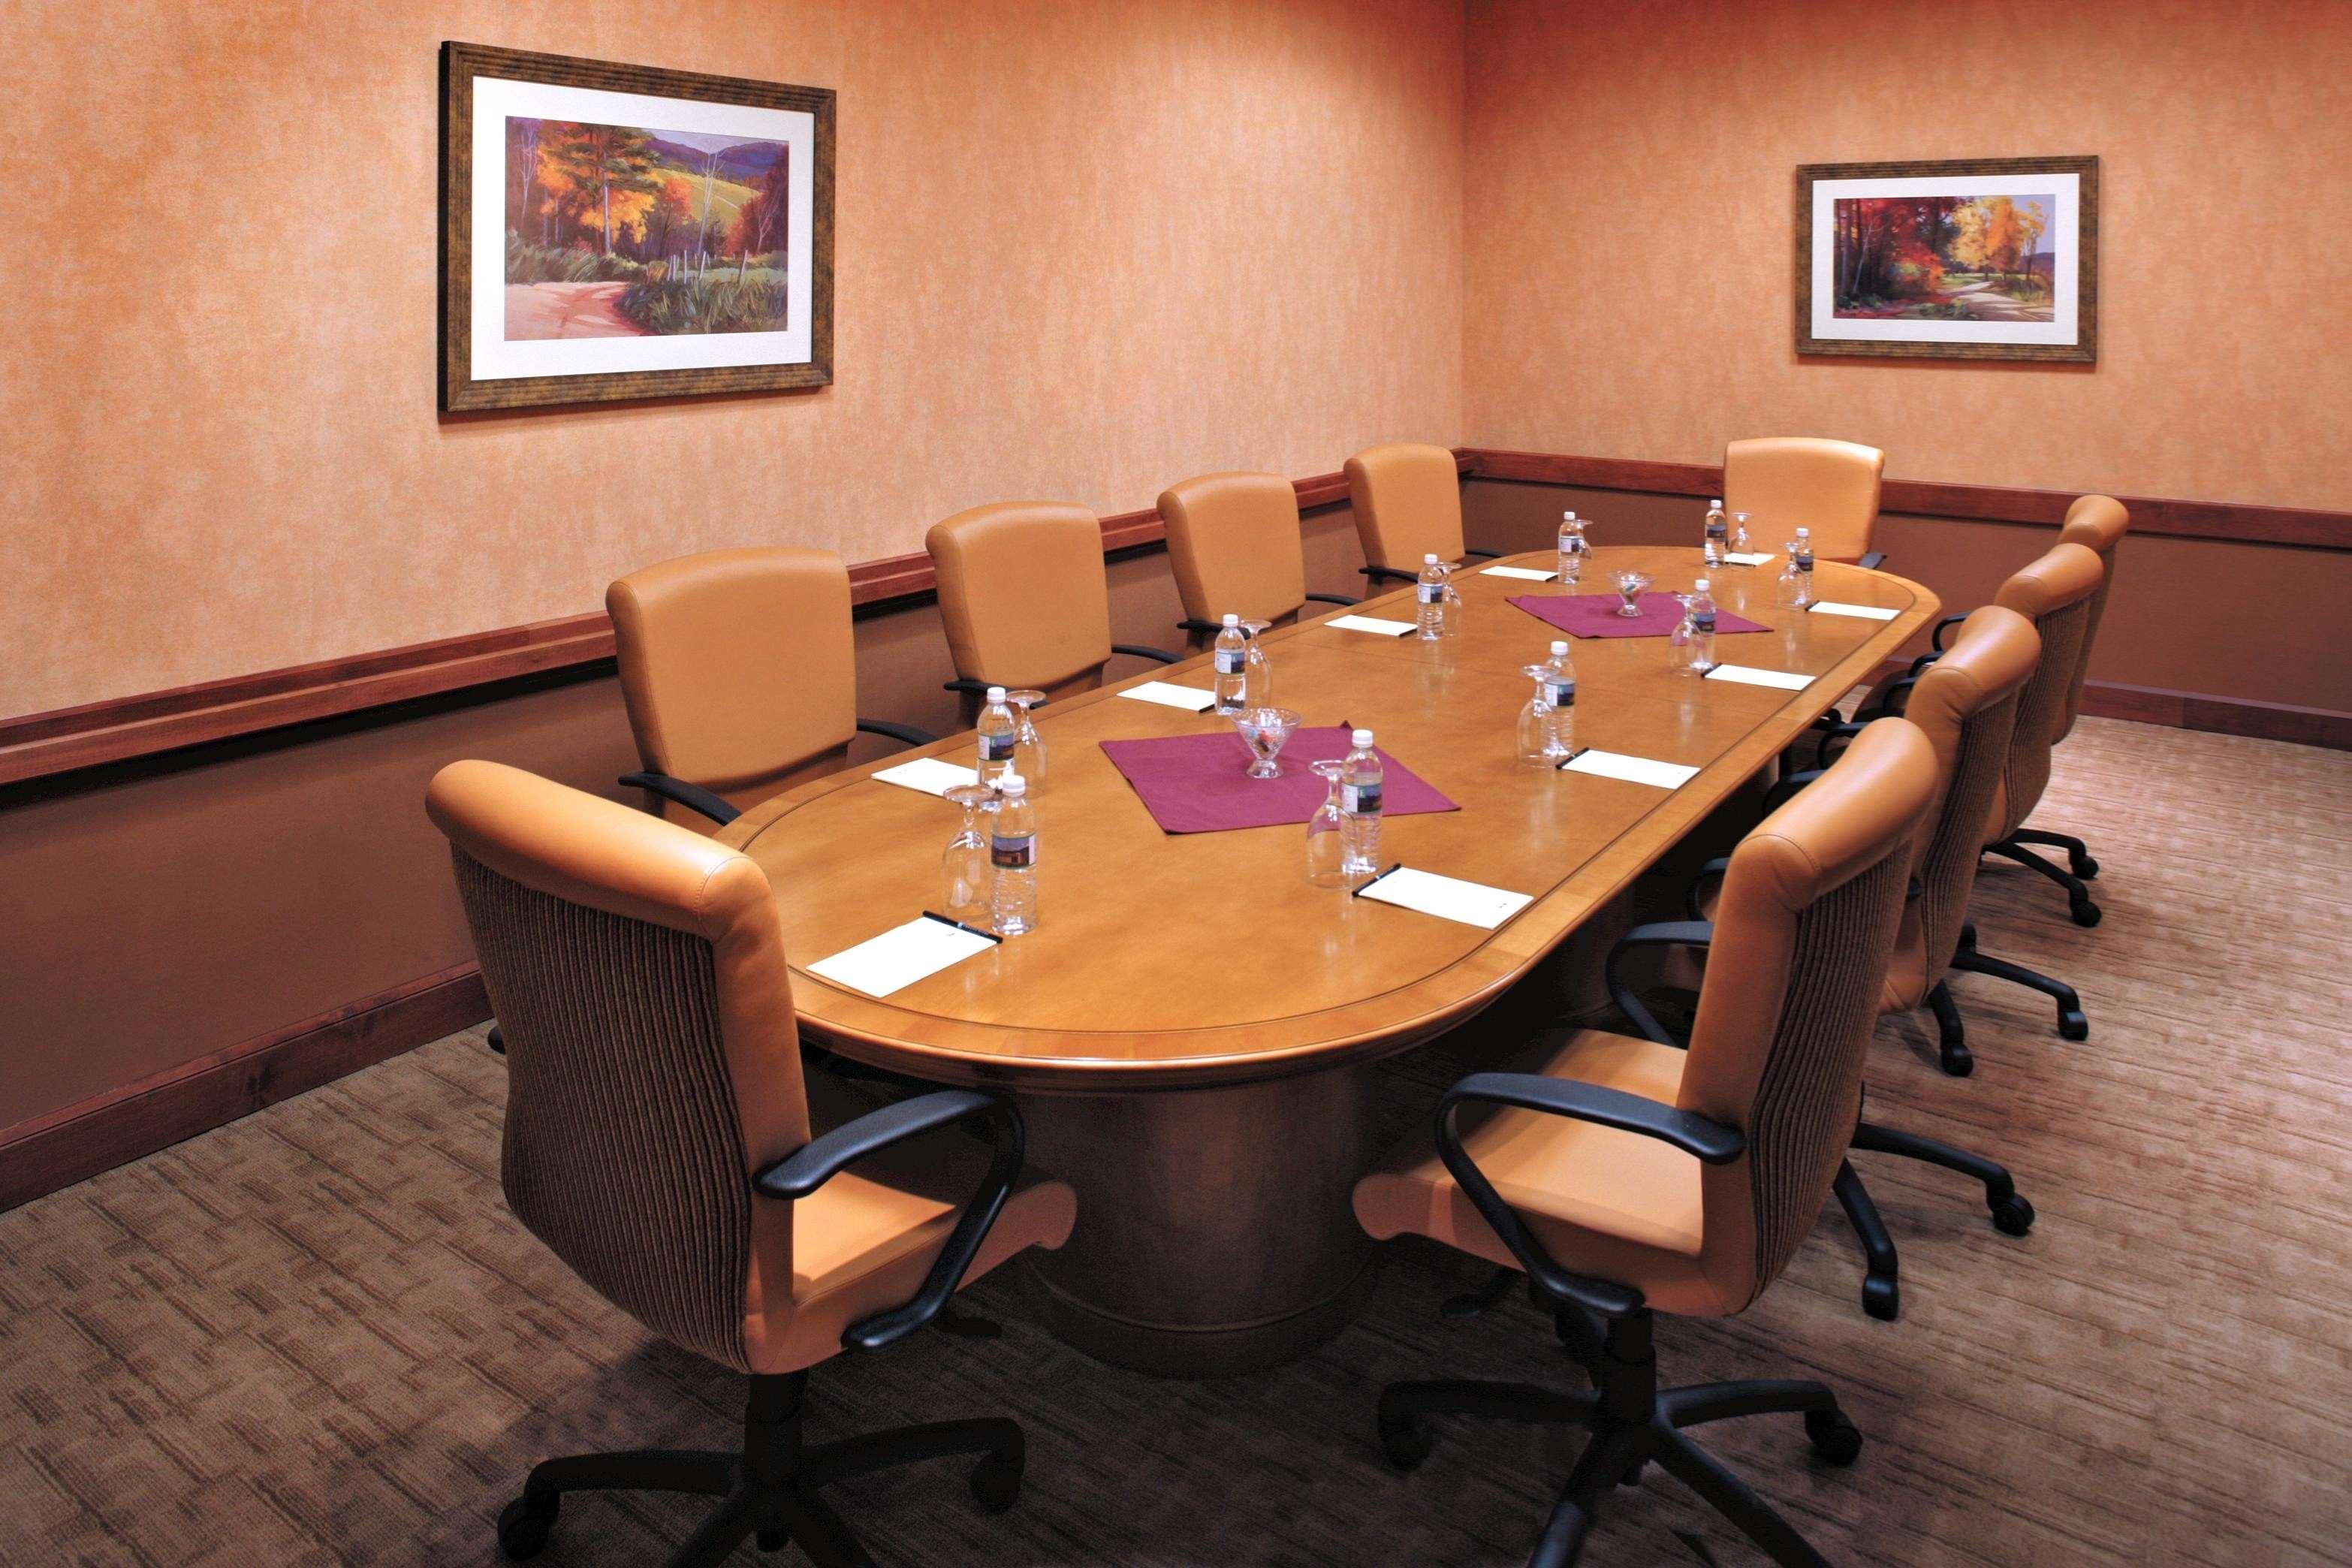 Embassy Suites by Hilton Albuquerque Hotel & Spa image 4